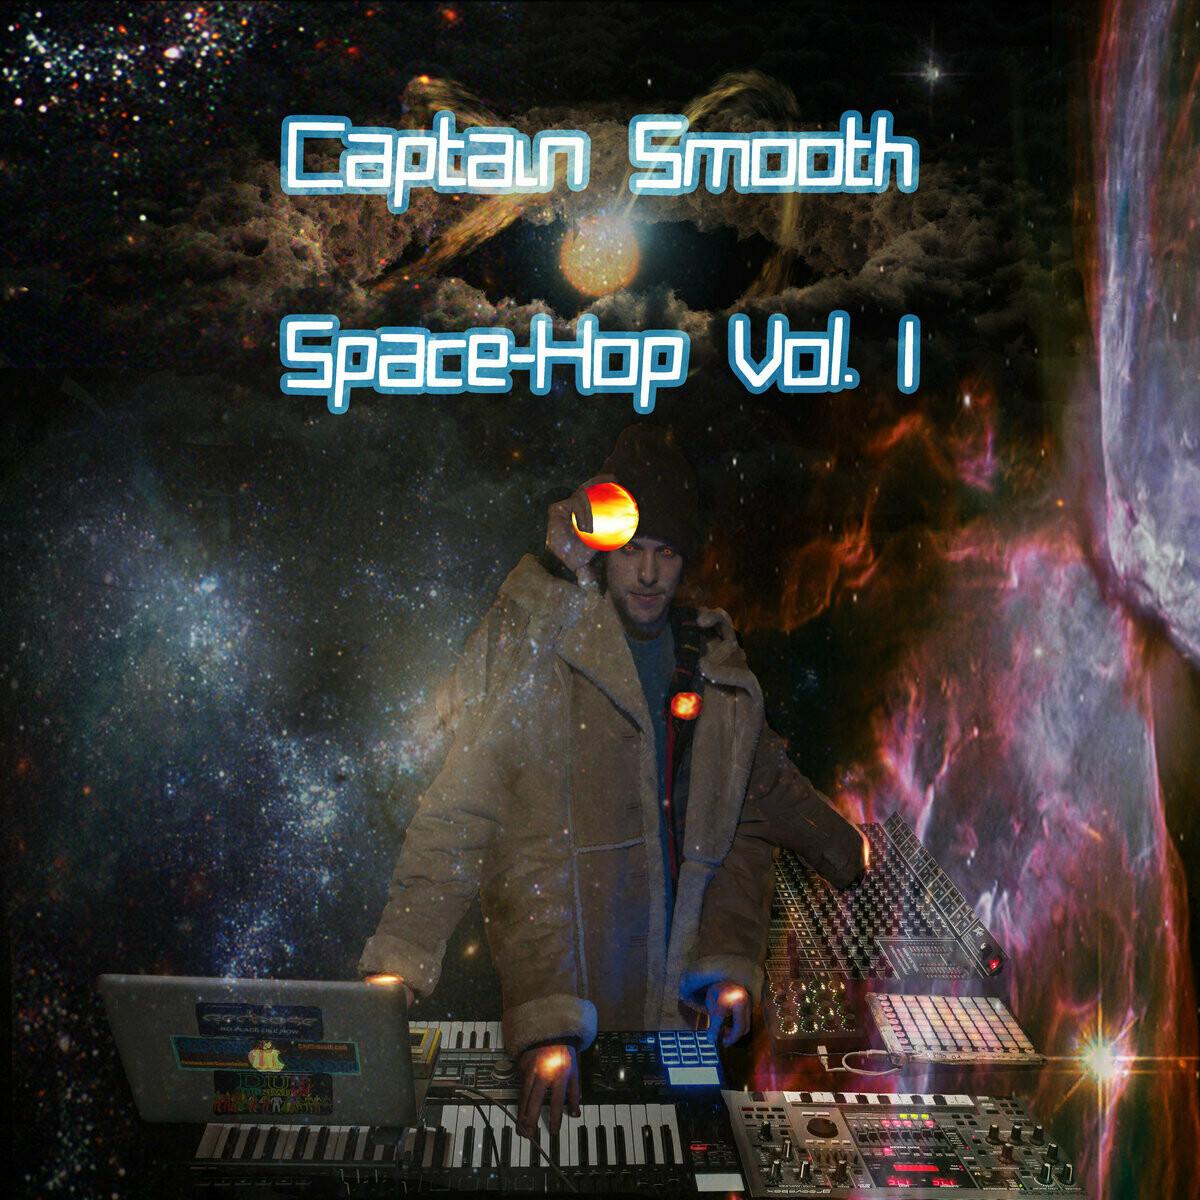 Captain Smooth-Space-Hop Vol. I